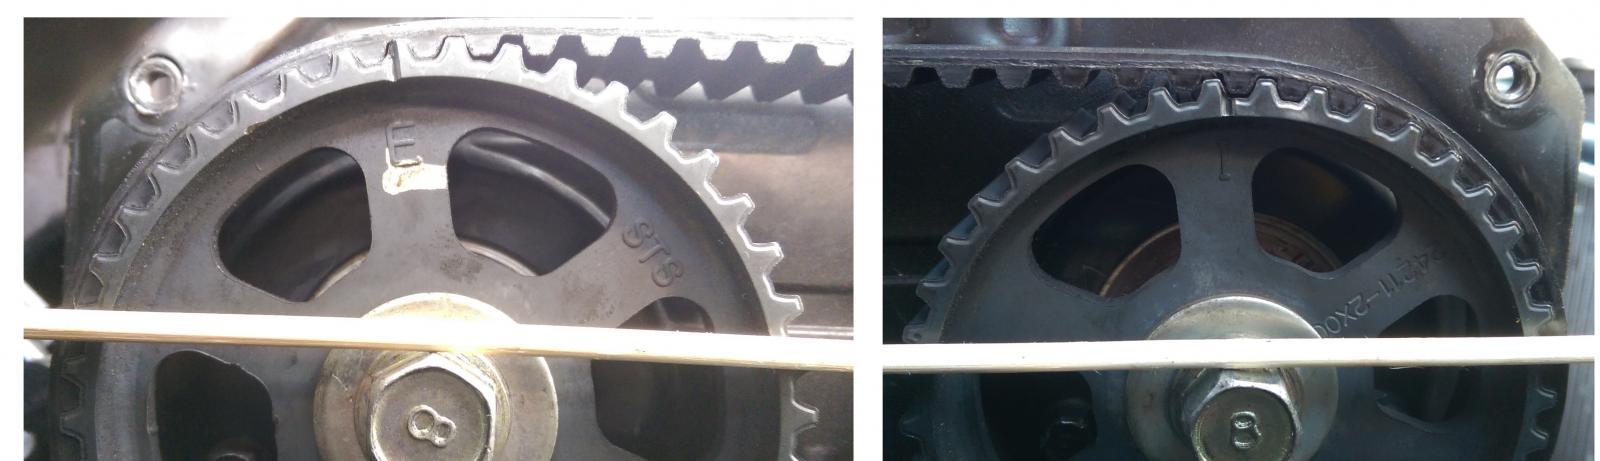 DIY Timing Belt - WARNING Interference Engine - Service Interval-timing-cam-position.jpg